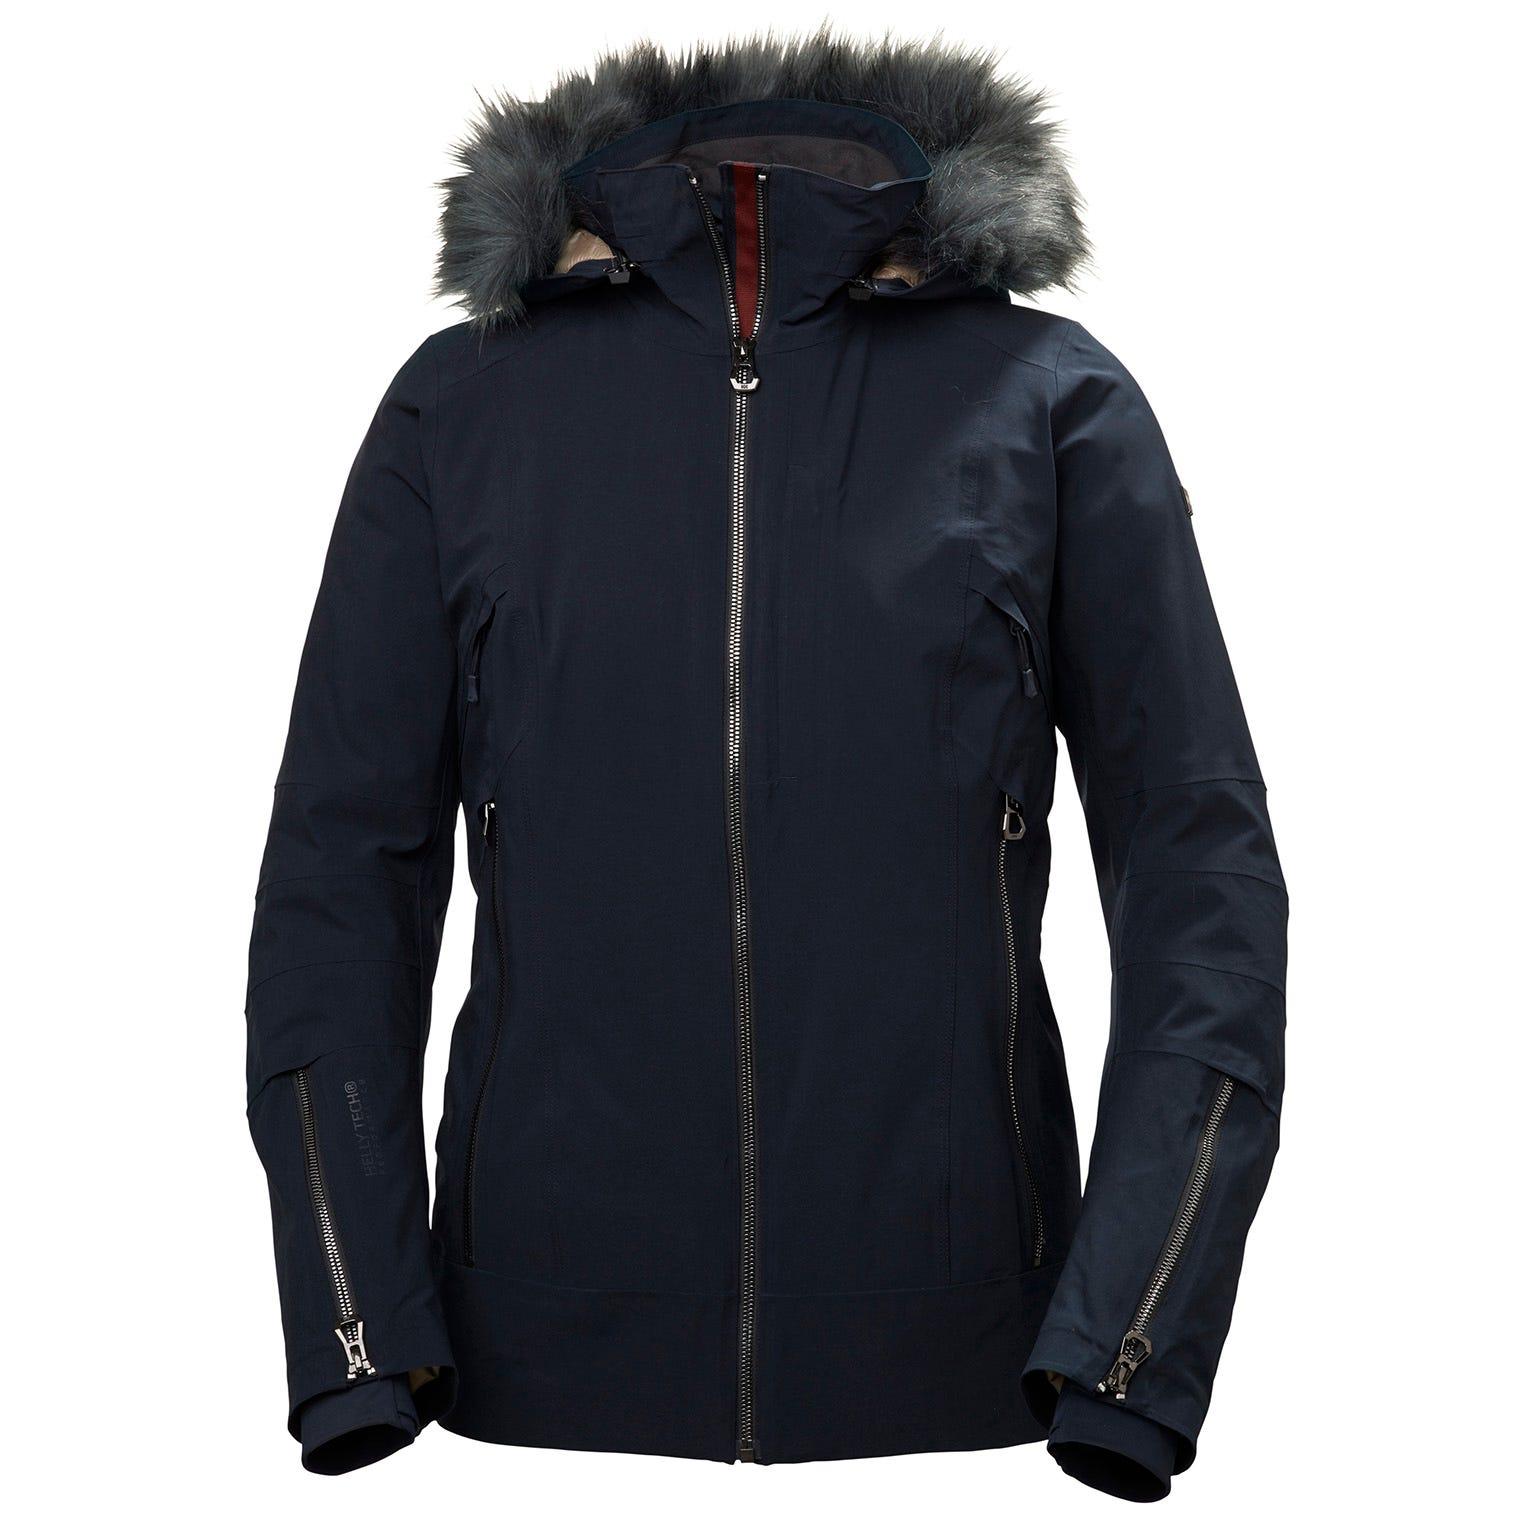 Helly Hansen Womens Snowdancer Ski Jacket With Faux Fur Hood Navy XL